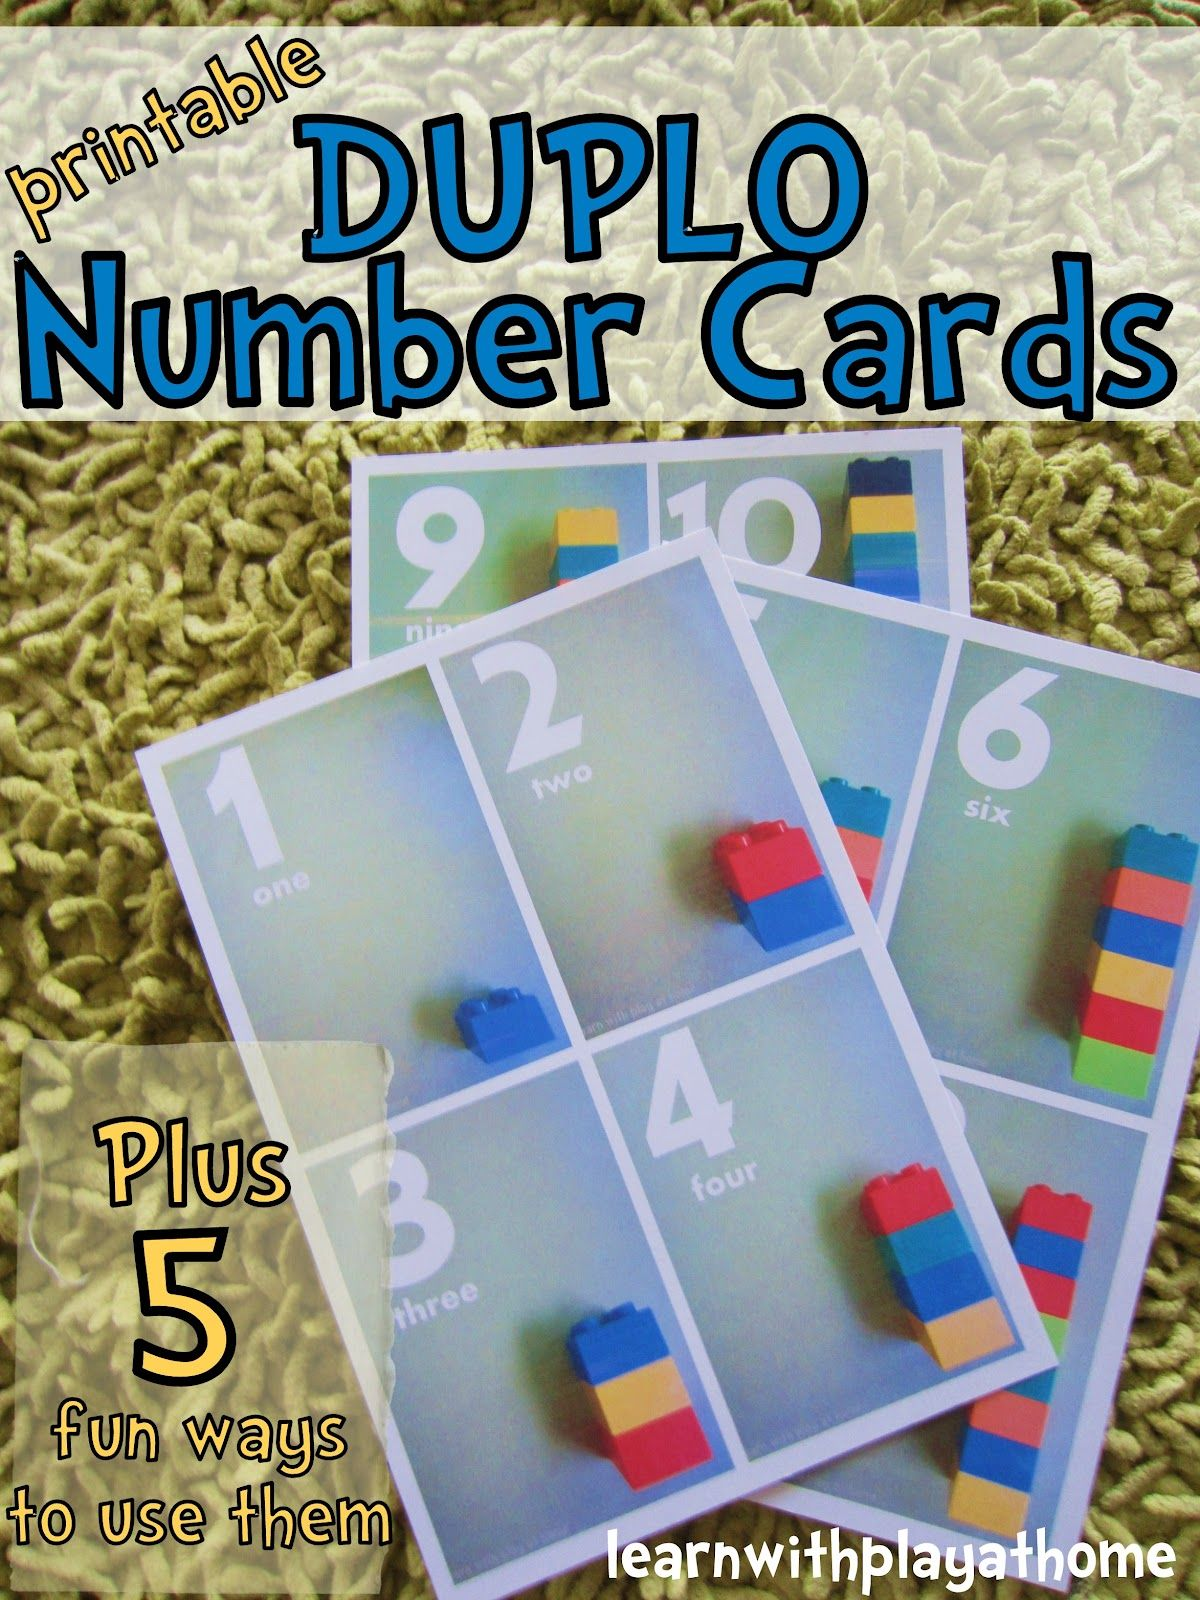 Printable Duplo Number Cards. Plus 5 fun ways to use them